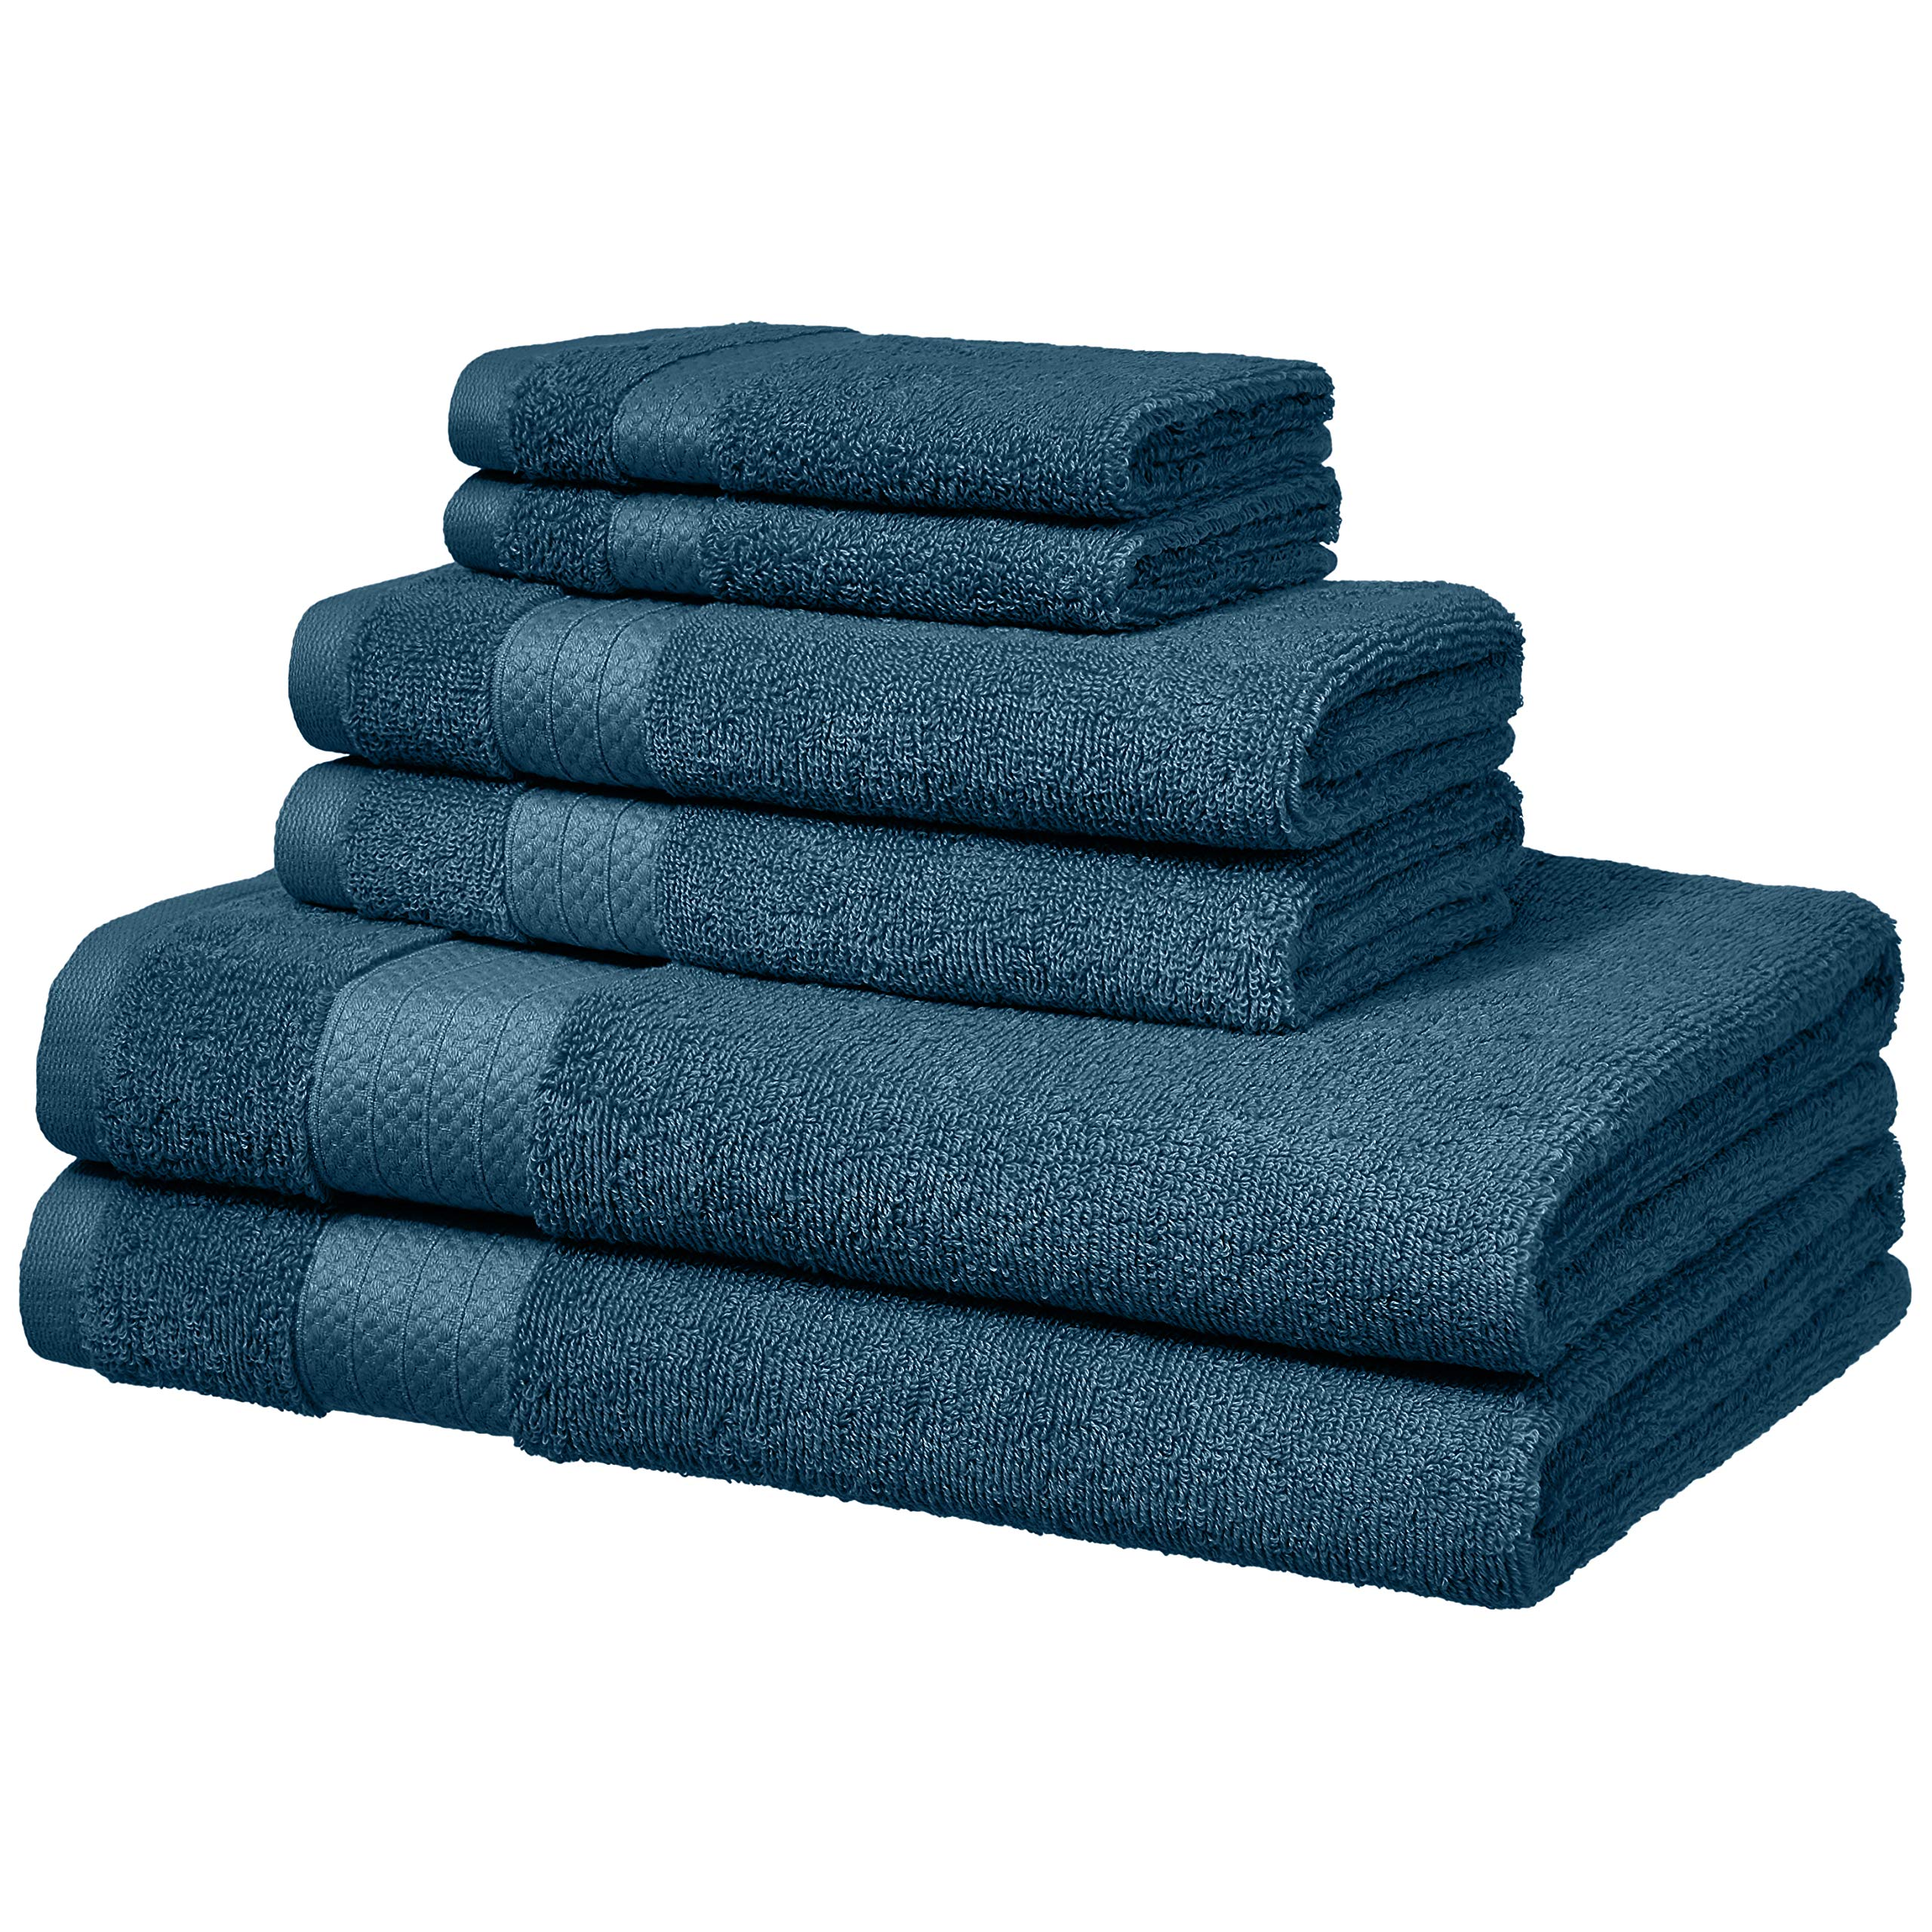 AmazonBasics Performance Bath Towels - 6 Piece Set, Hydro Blue